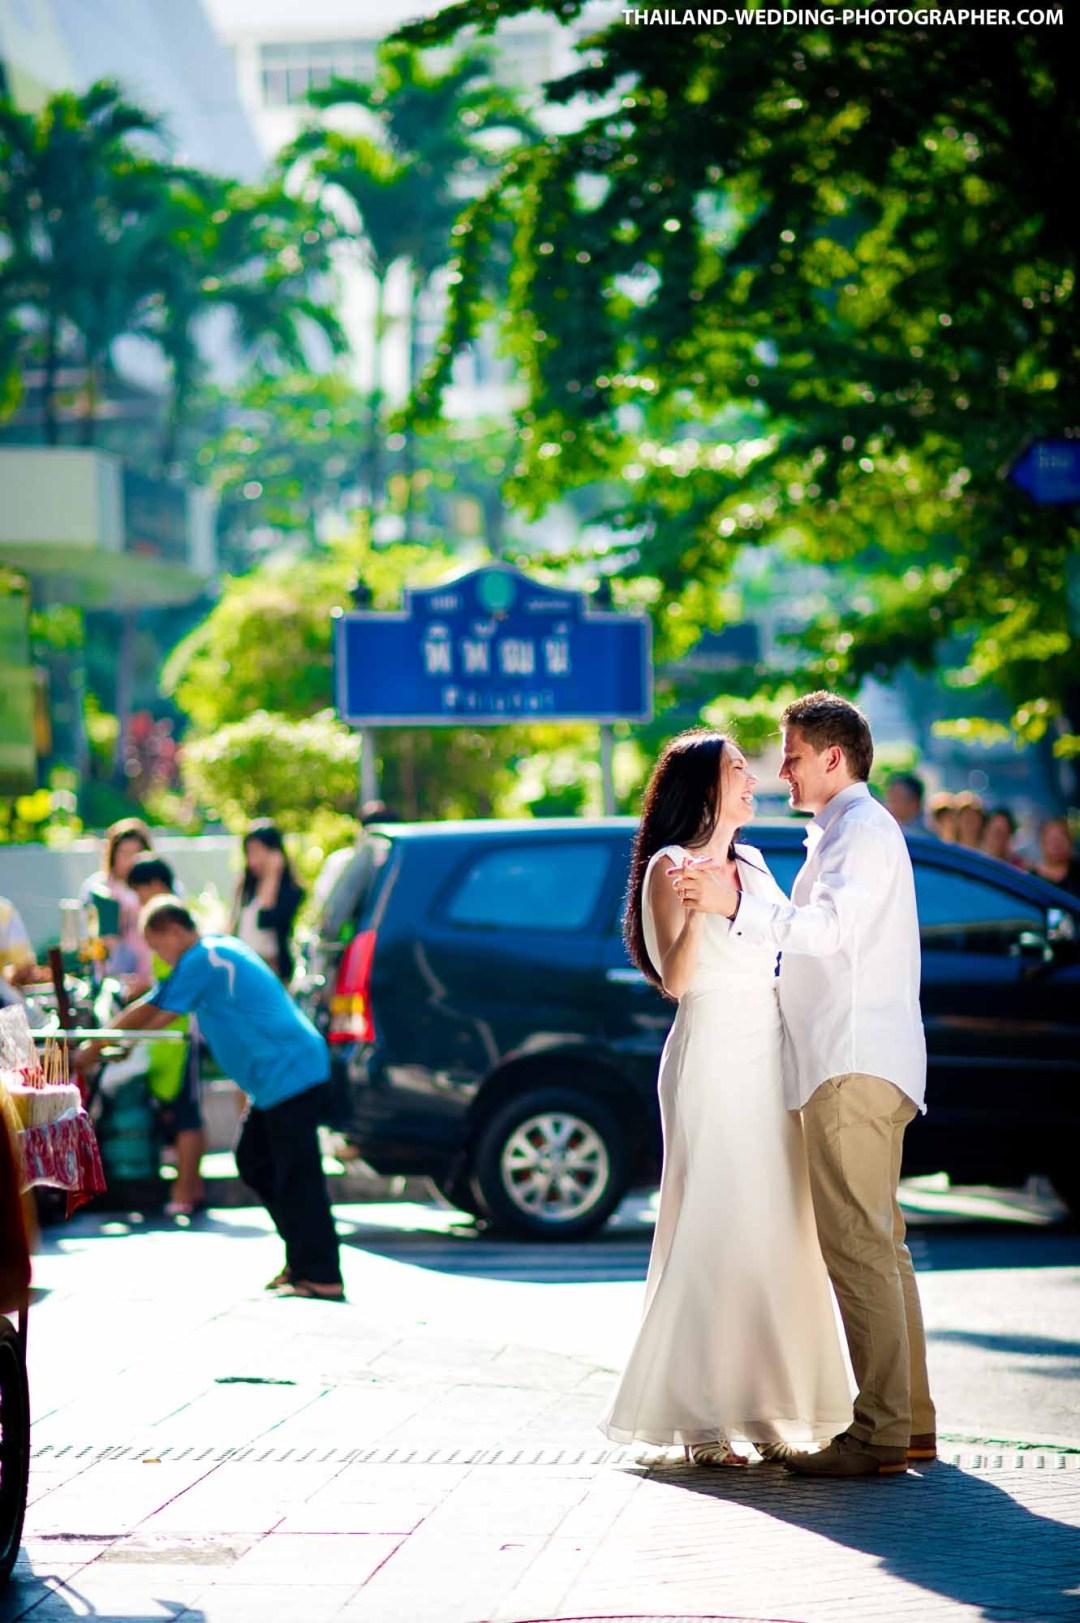 Silom Bangkok Thailand Wedding Photography